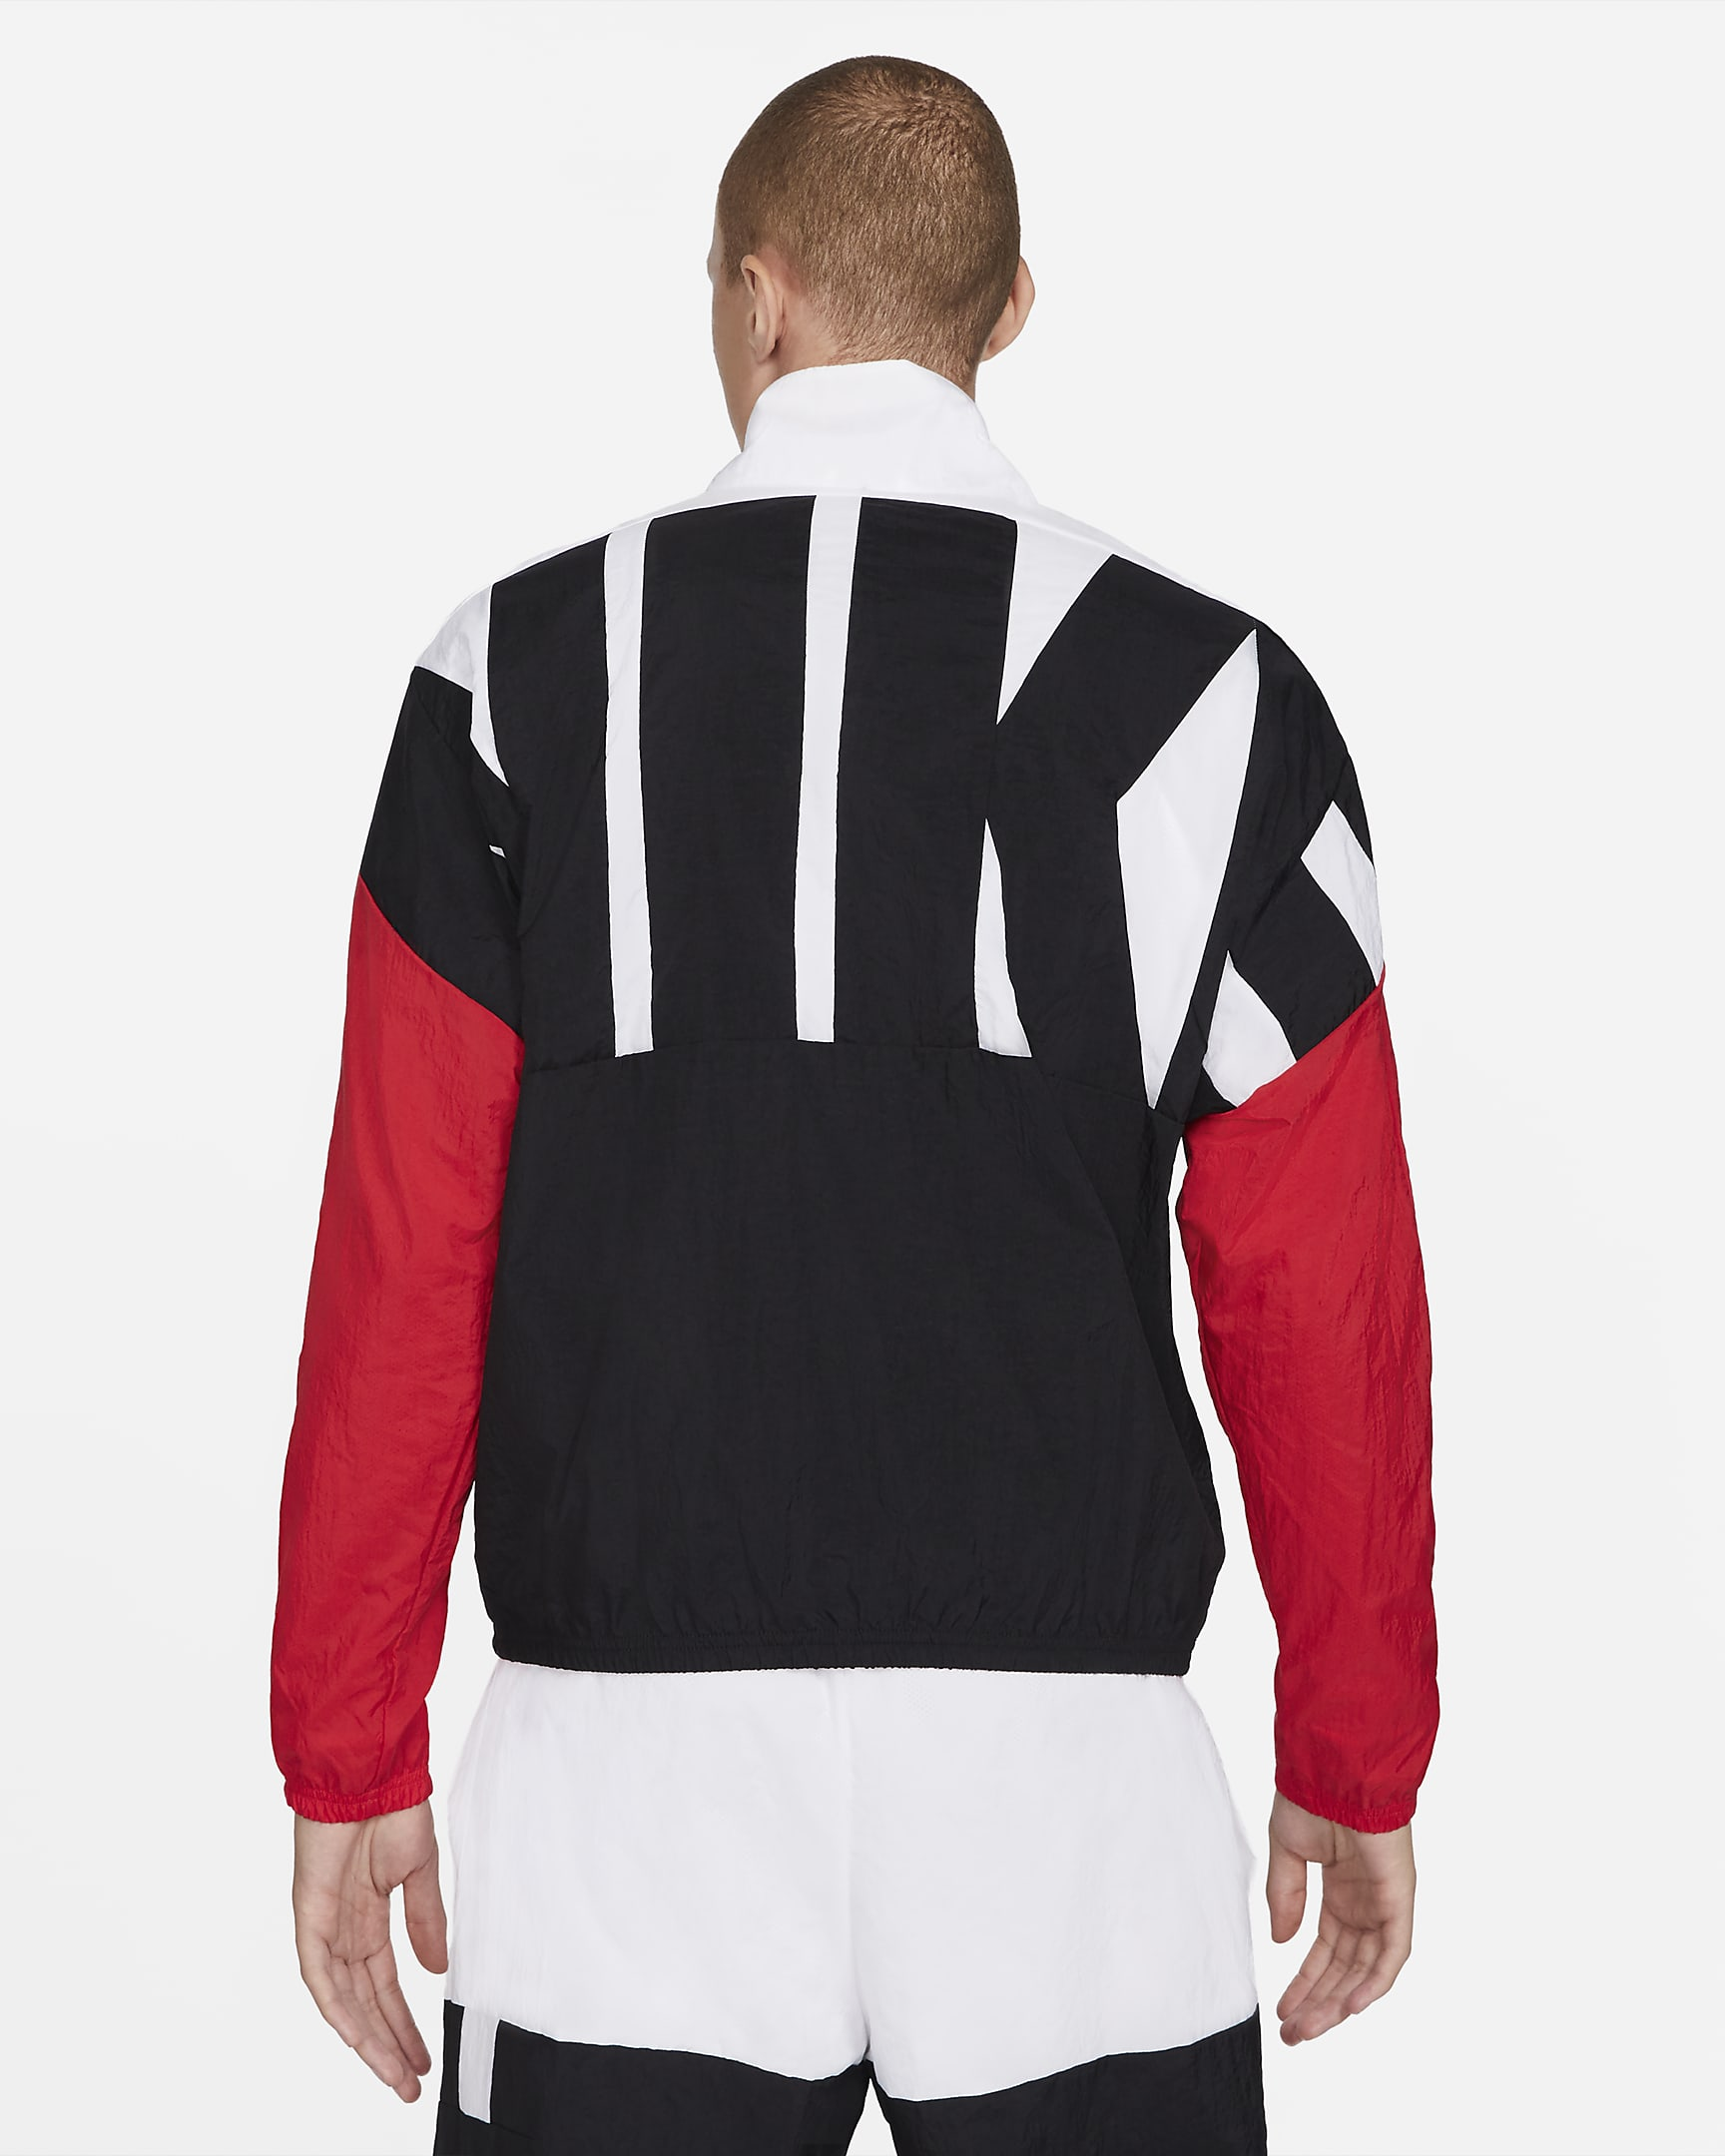 mens-basketball-jacket-0B6KC3-1